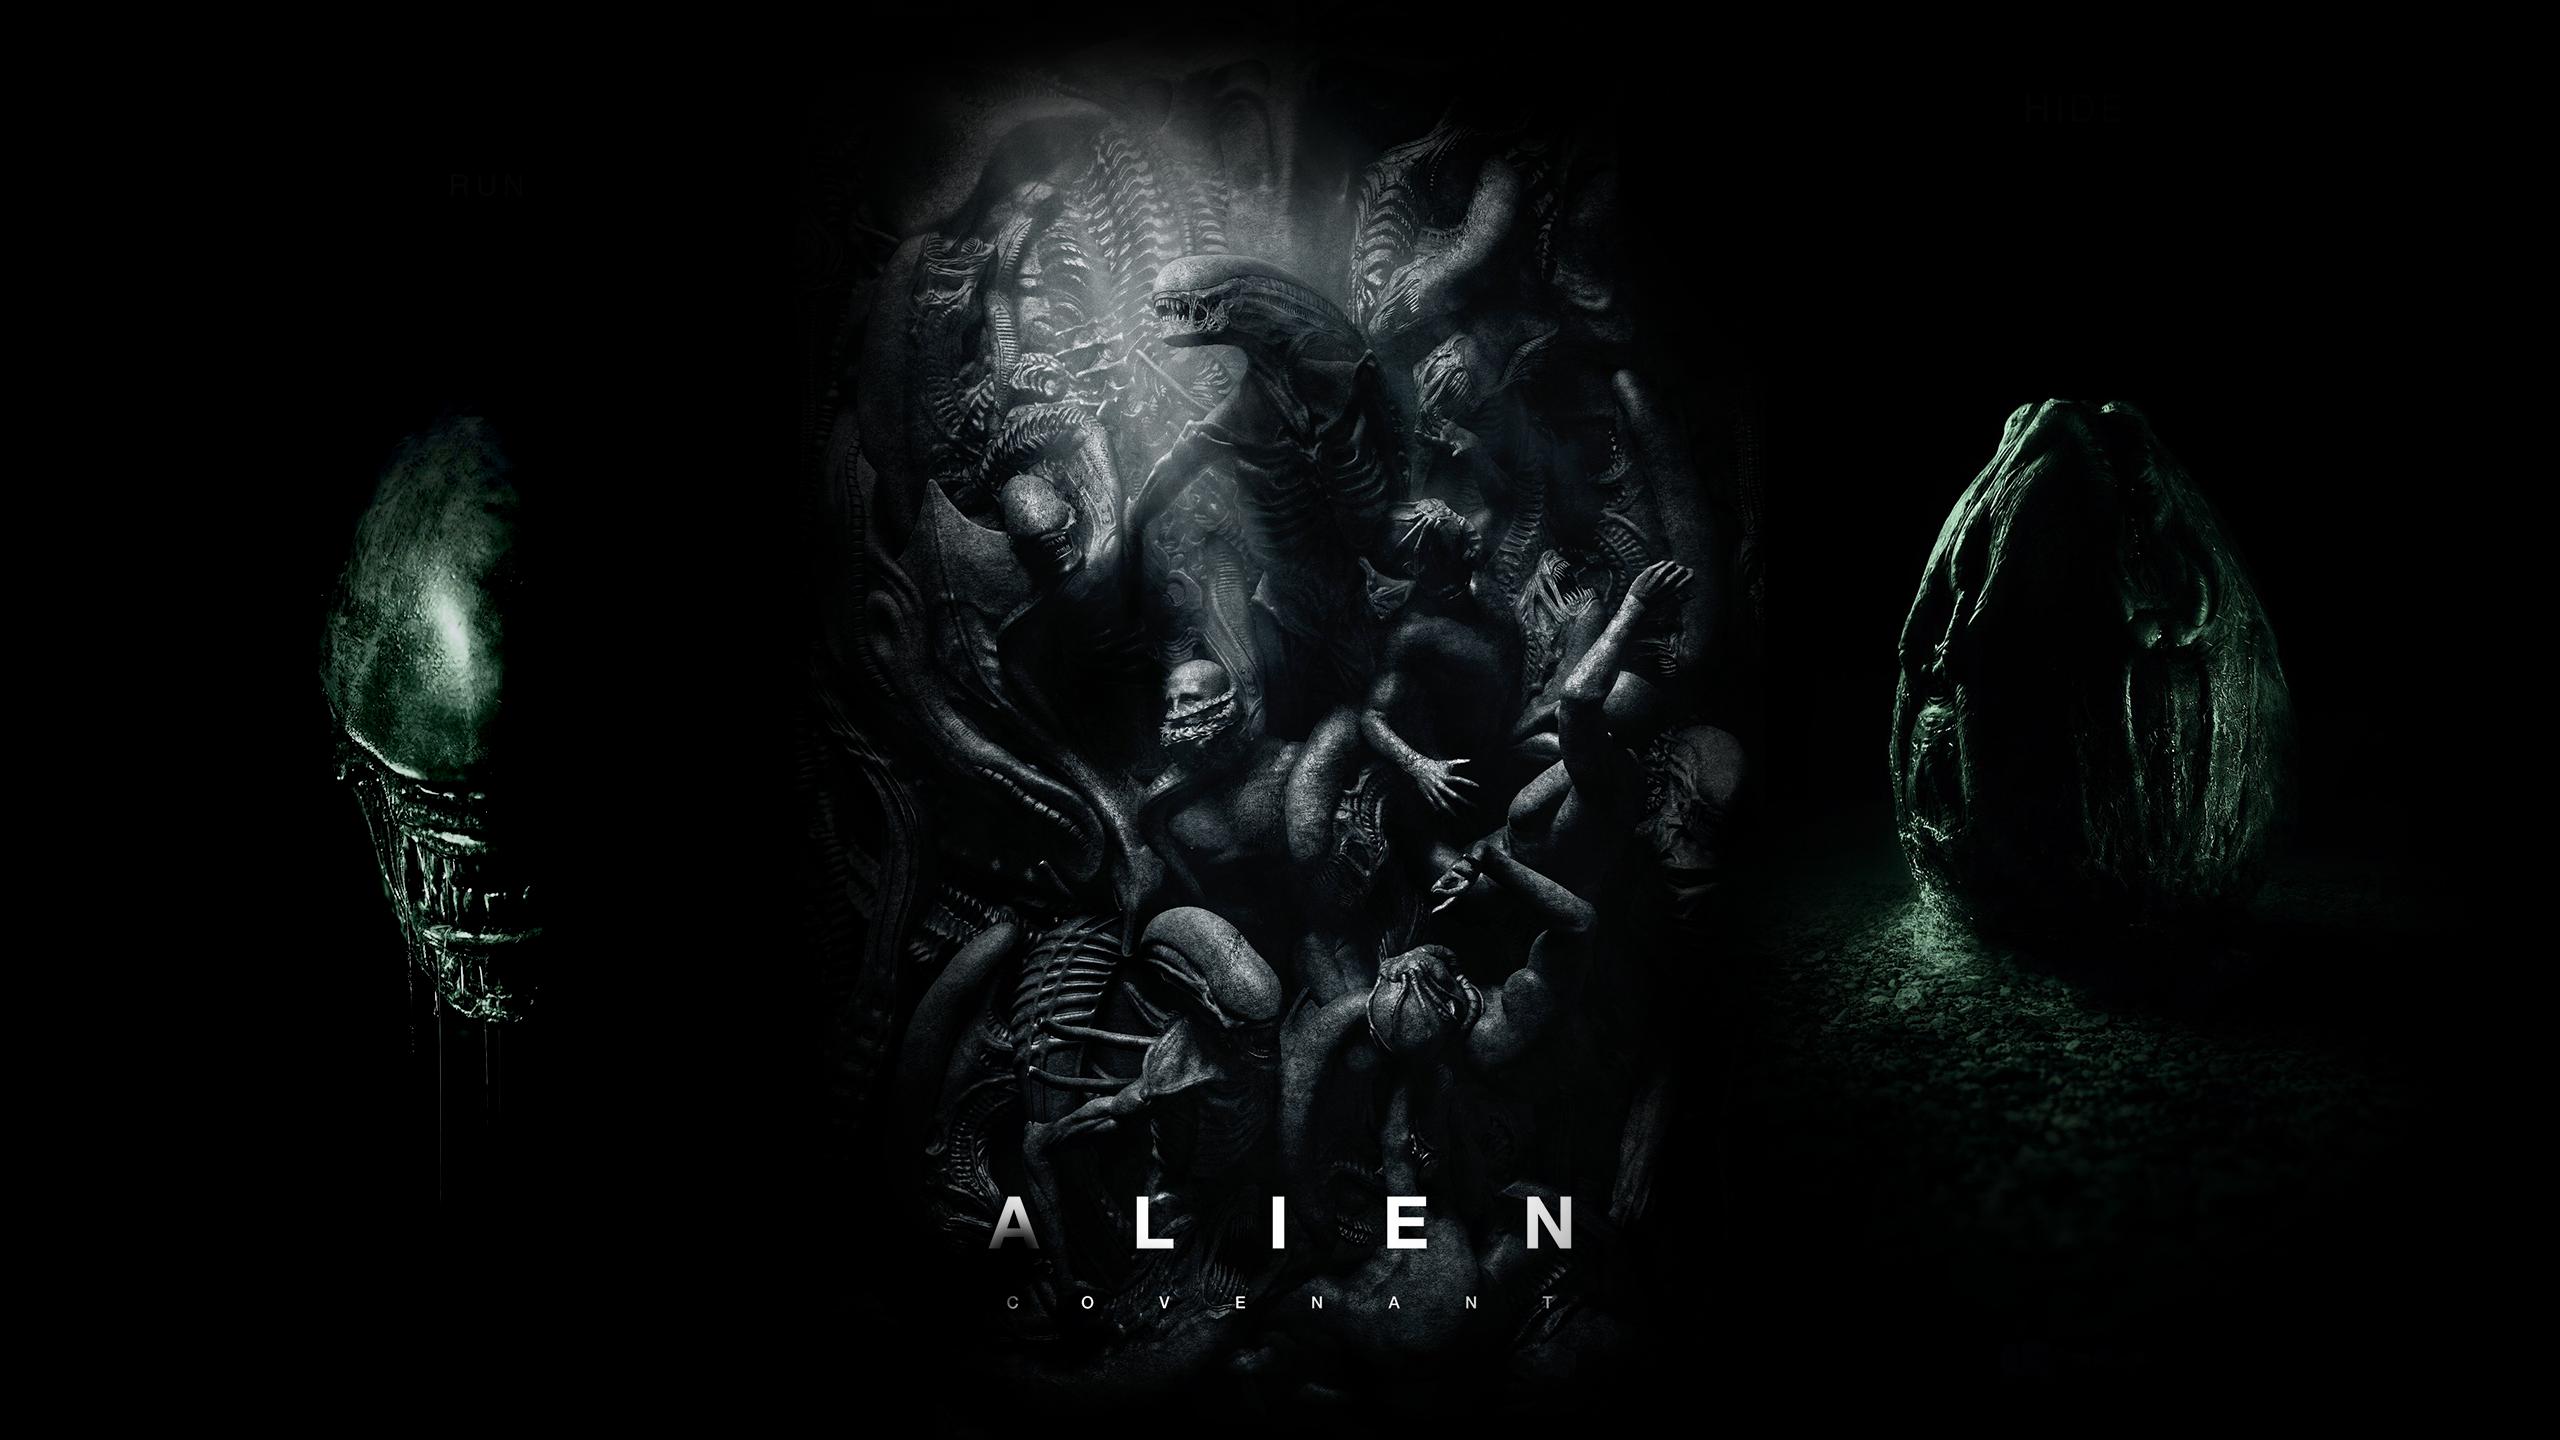 [2560x1440] Alien Covenant WALLPAPERS Pinterest